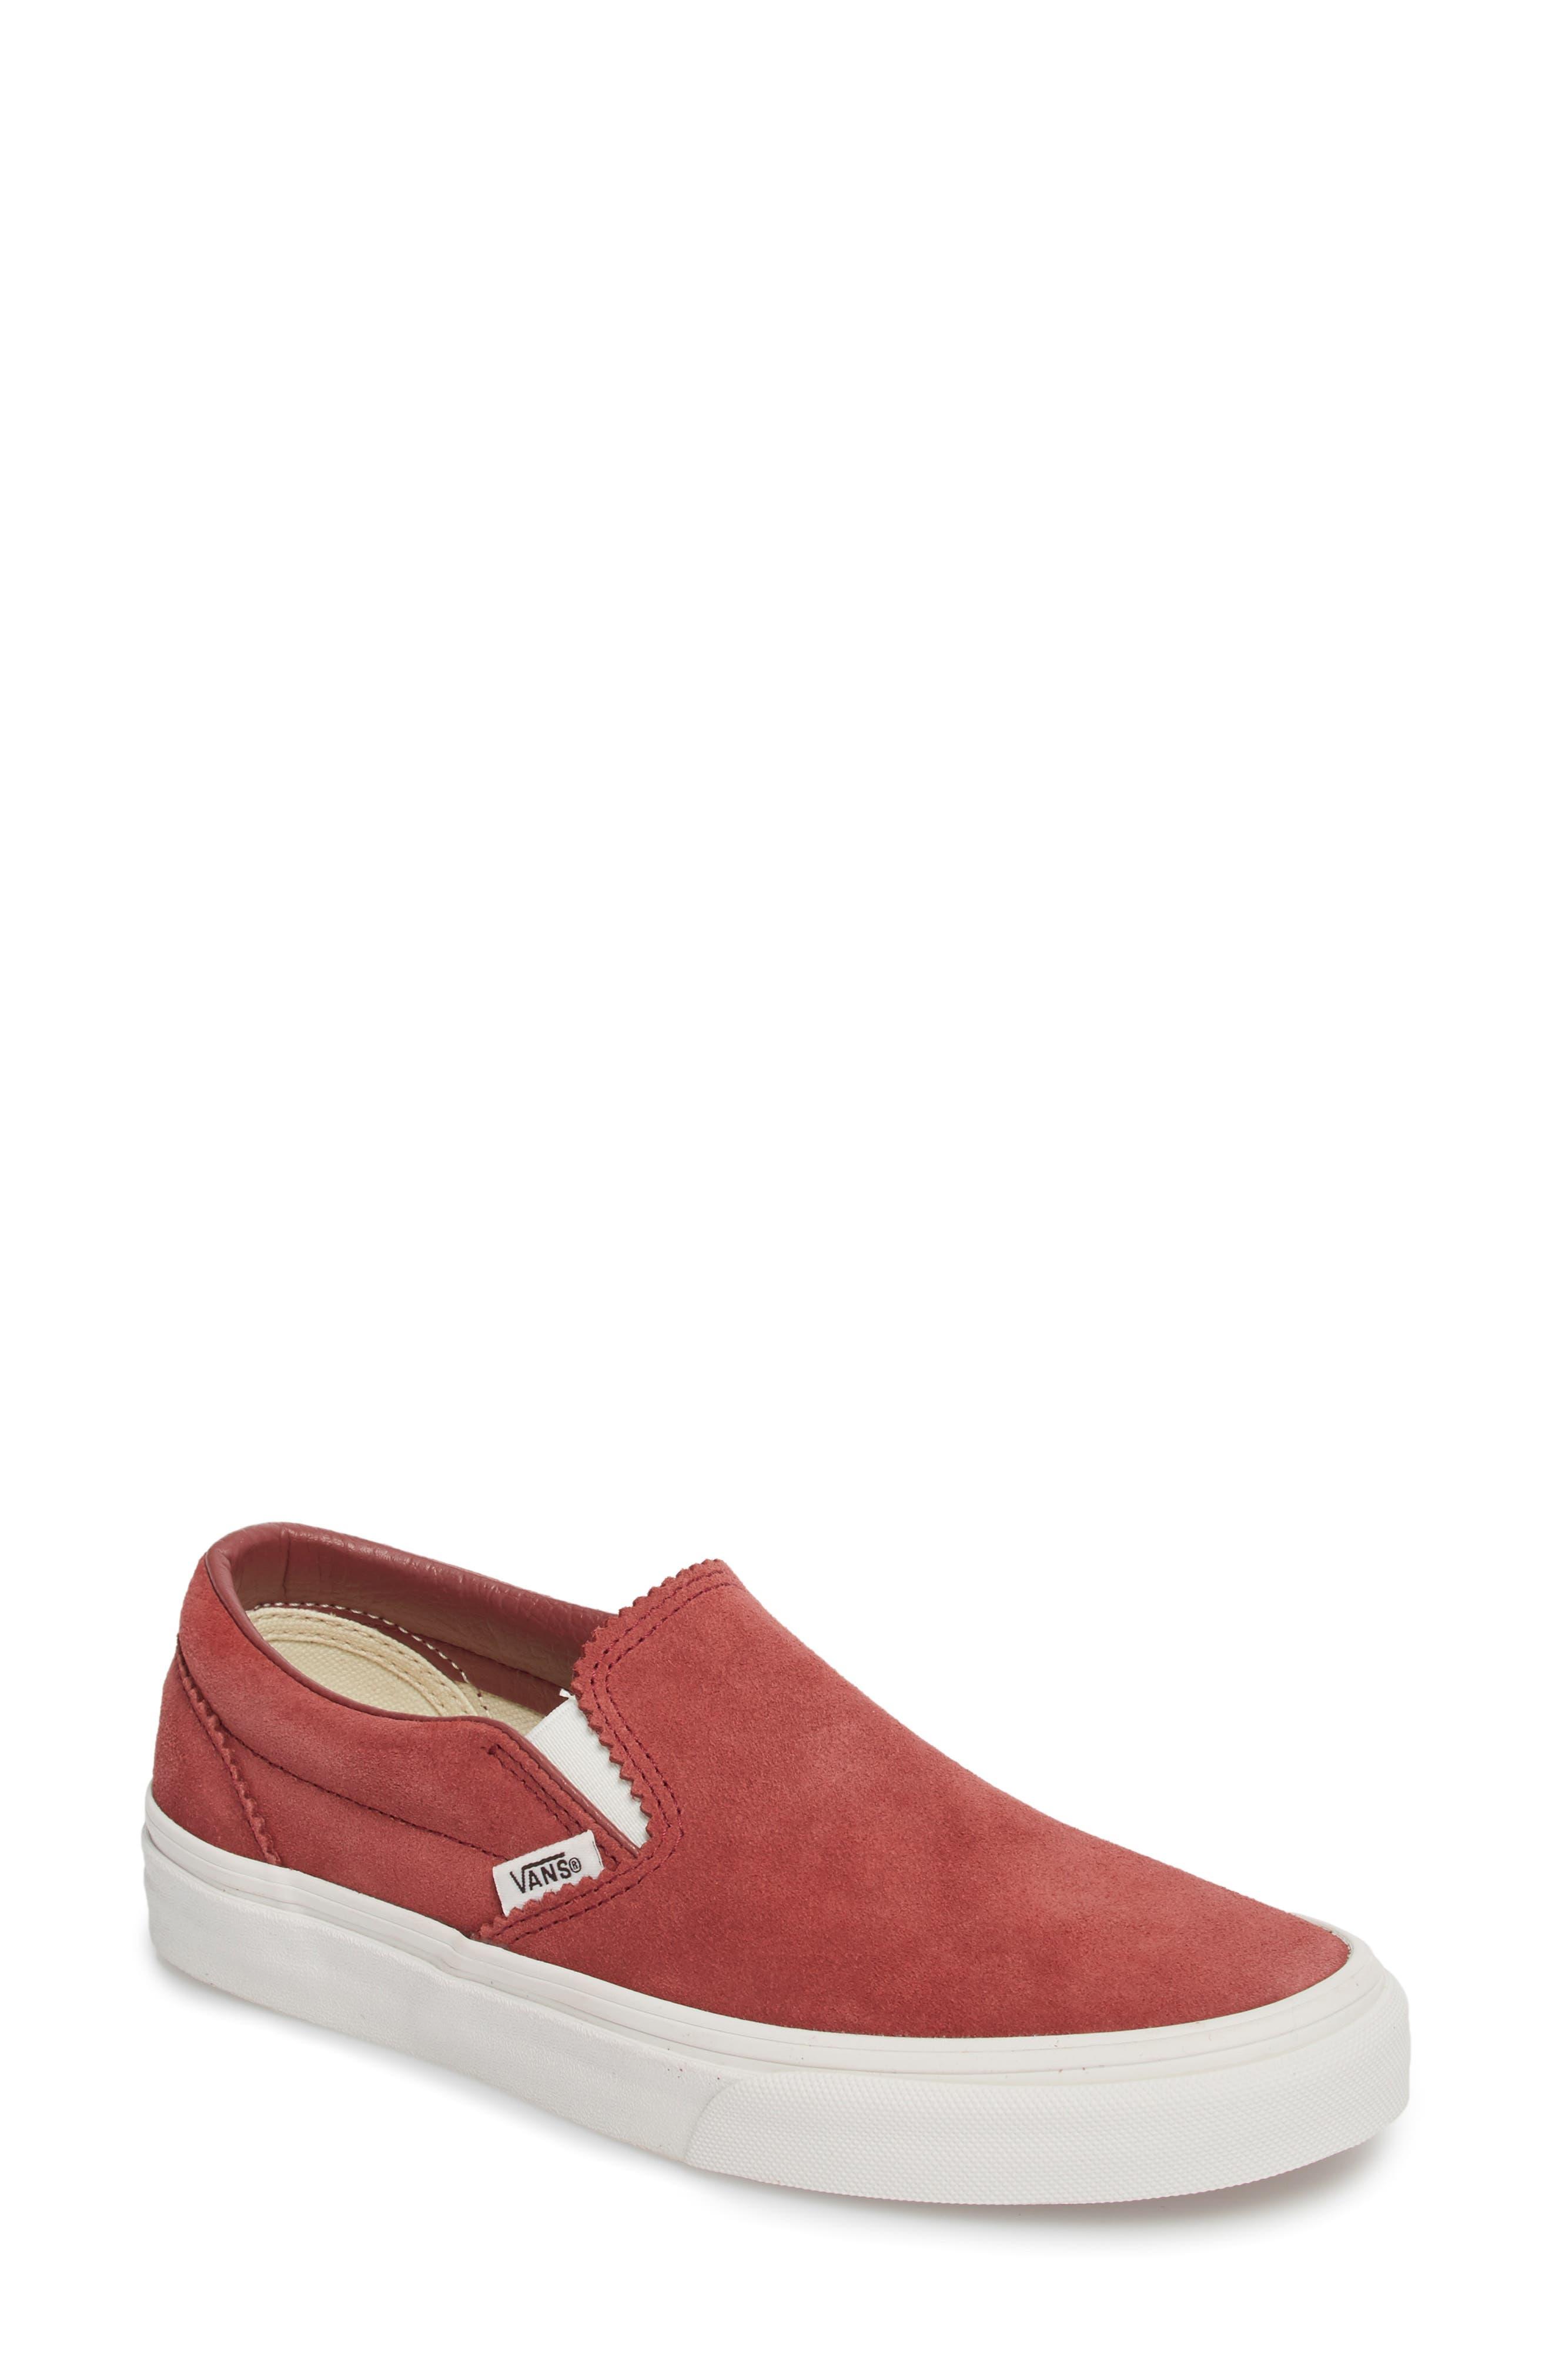 ,                             Classic Slip-On Sneaker,                             Main thumbnail 177, color,                             600